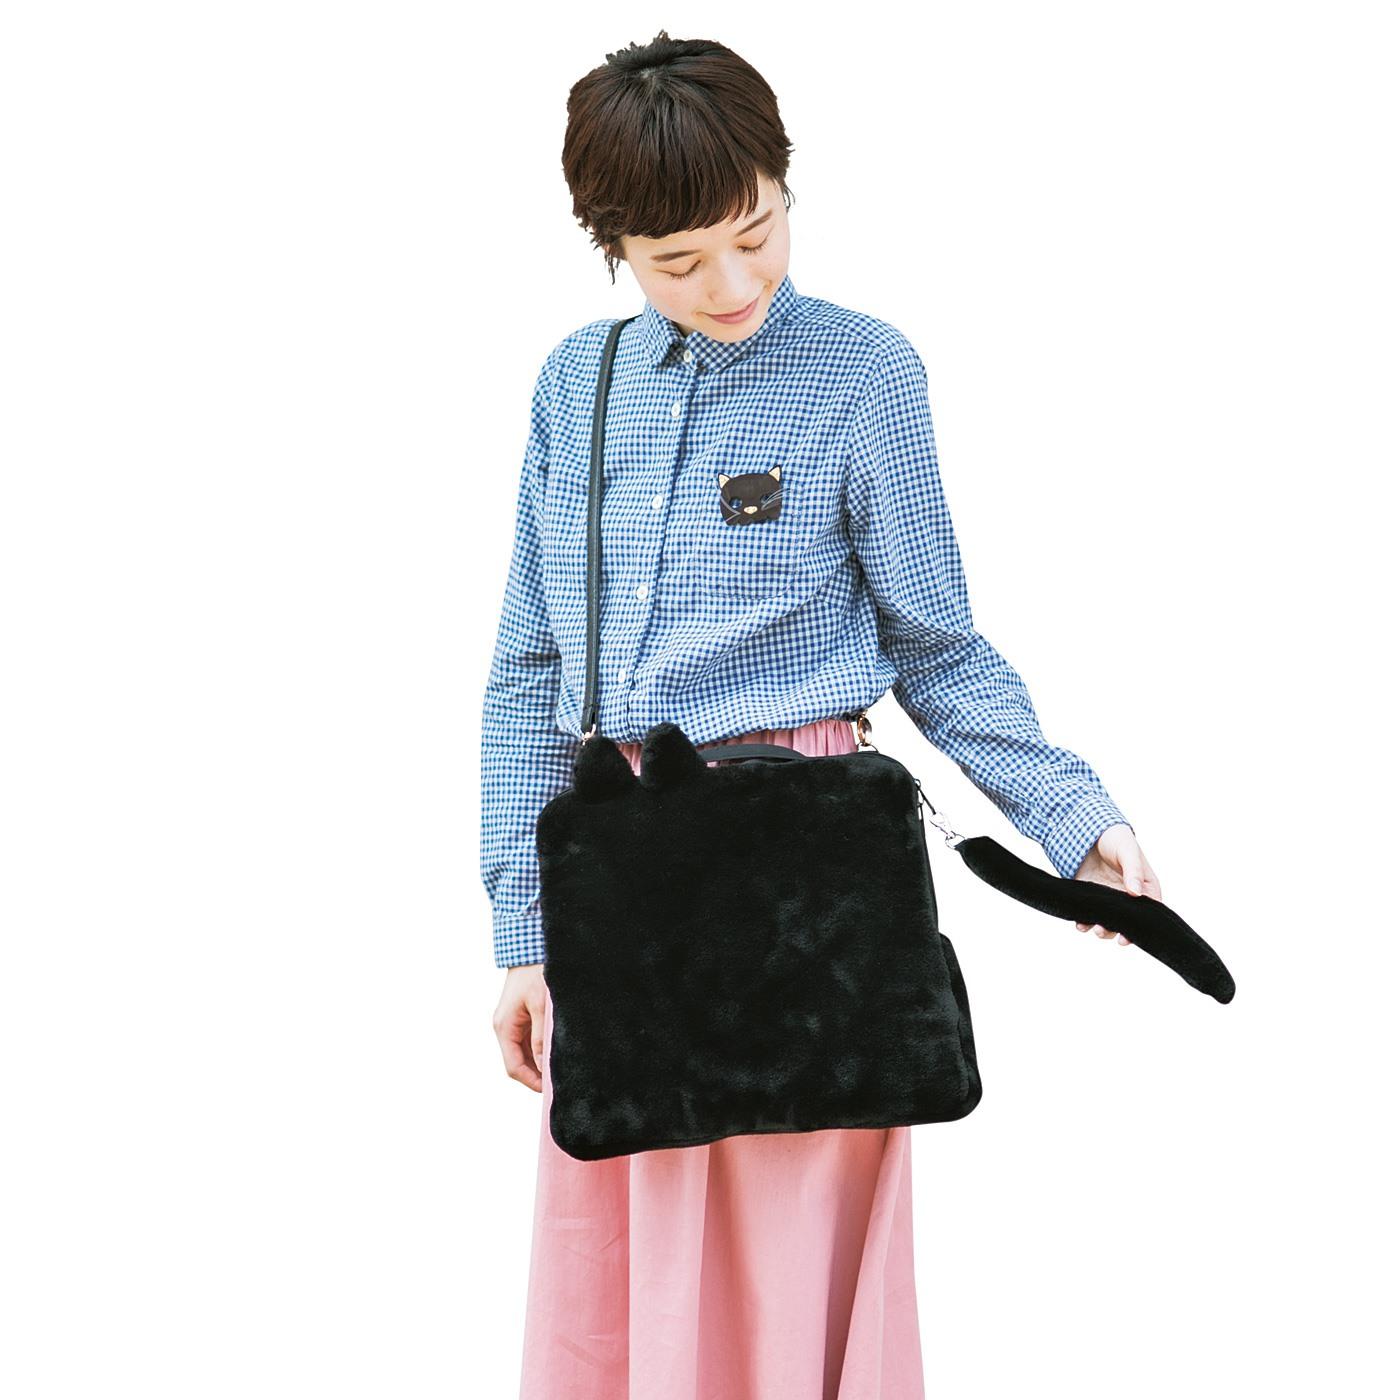 Dカン付きだから、お手持ちのショルダーベルトを取り付けて、ショルダーバッグとしても使えます。